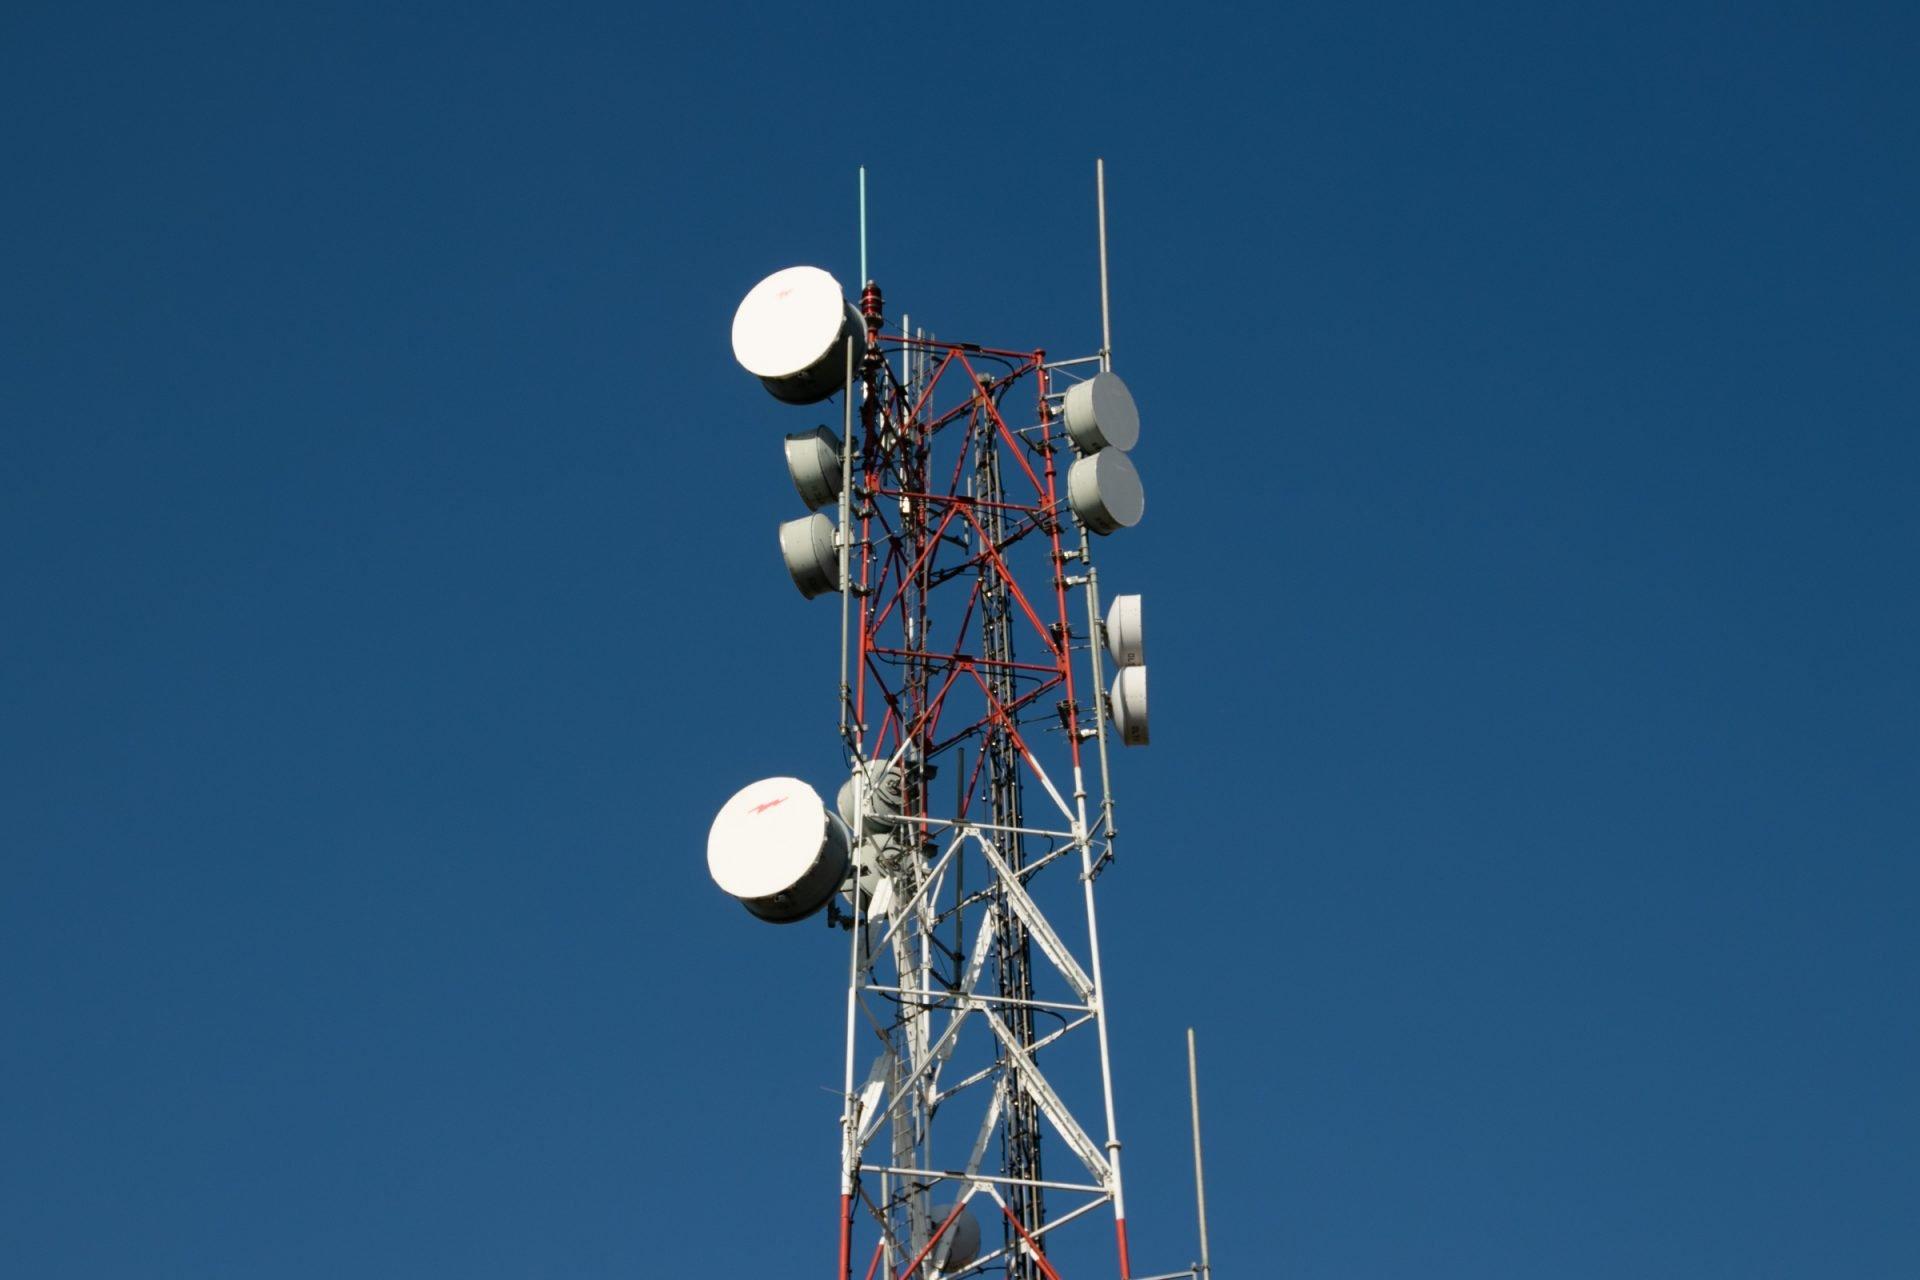 Satellite Dishes On Radio Tower